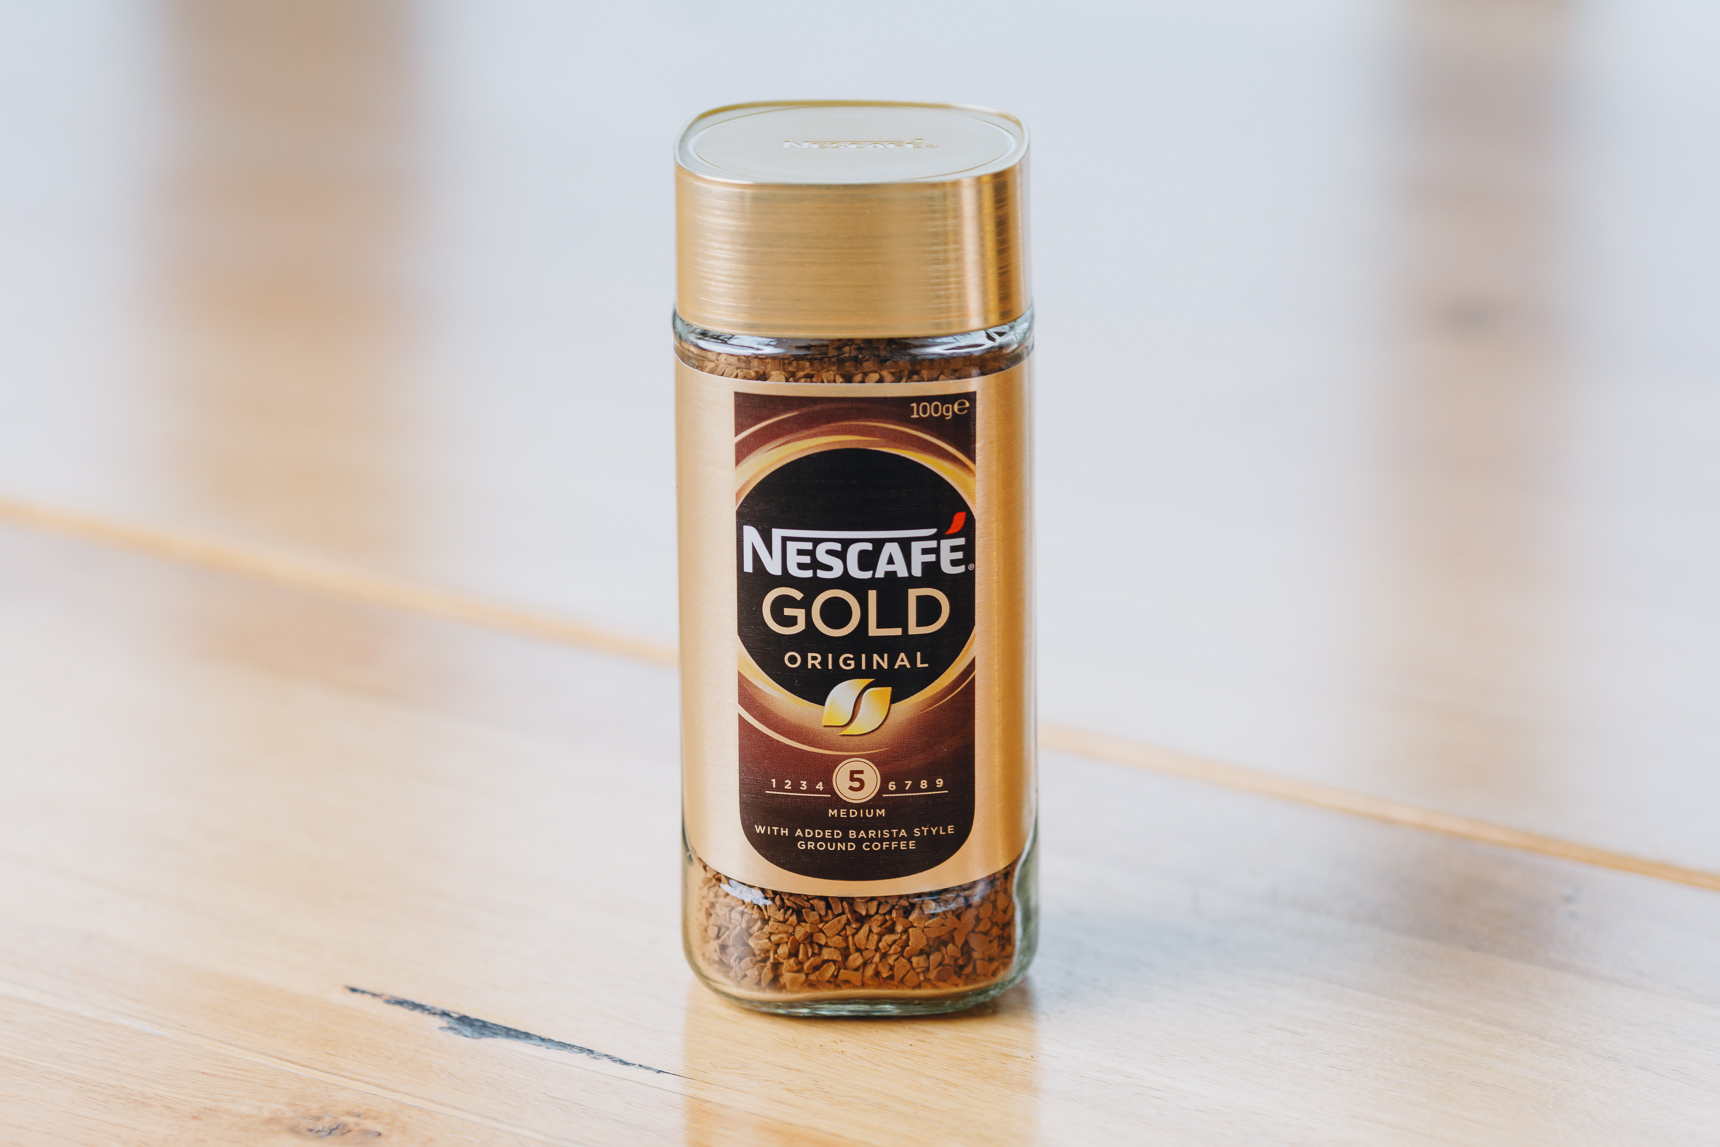 JNescafe Gold